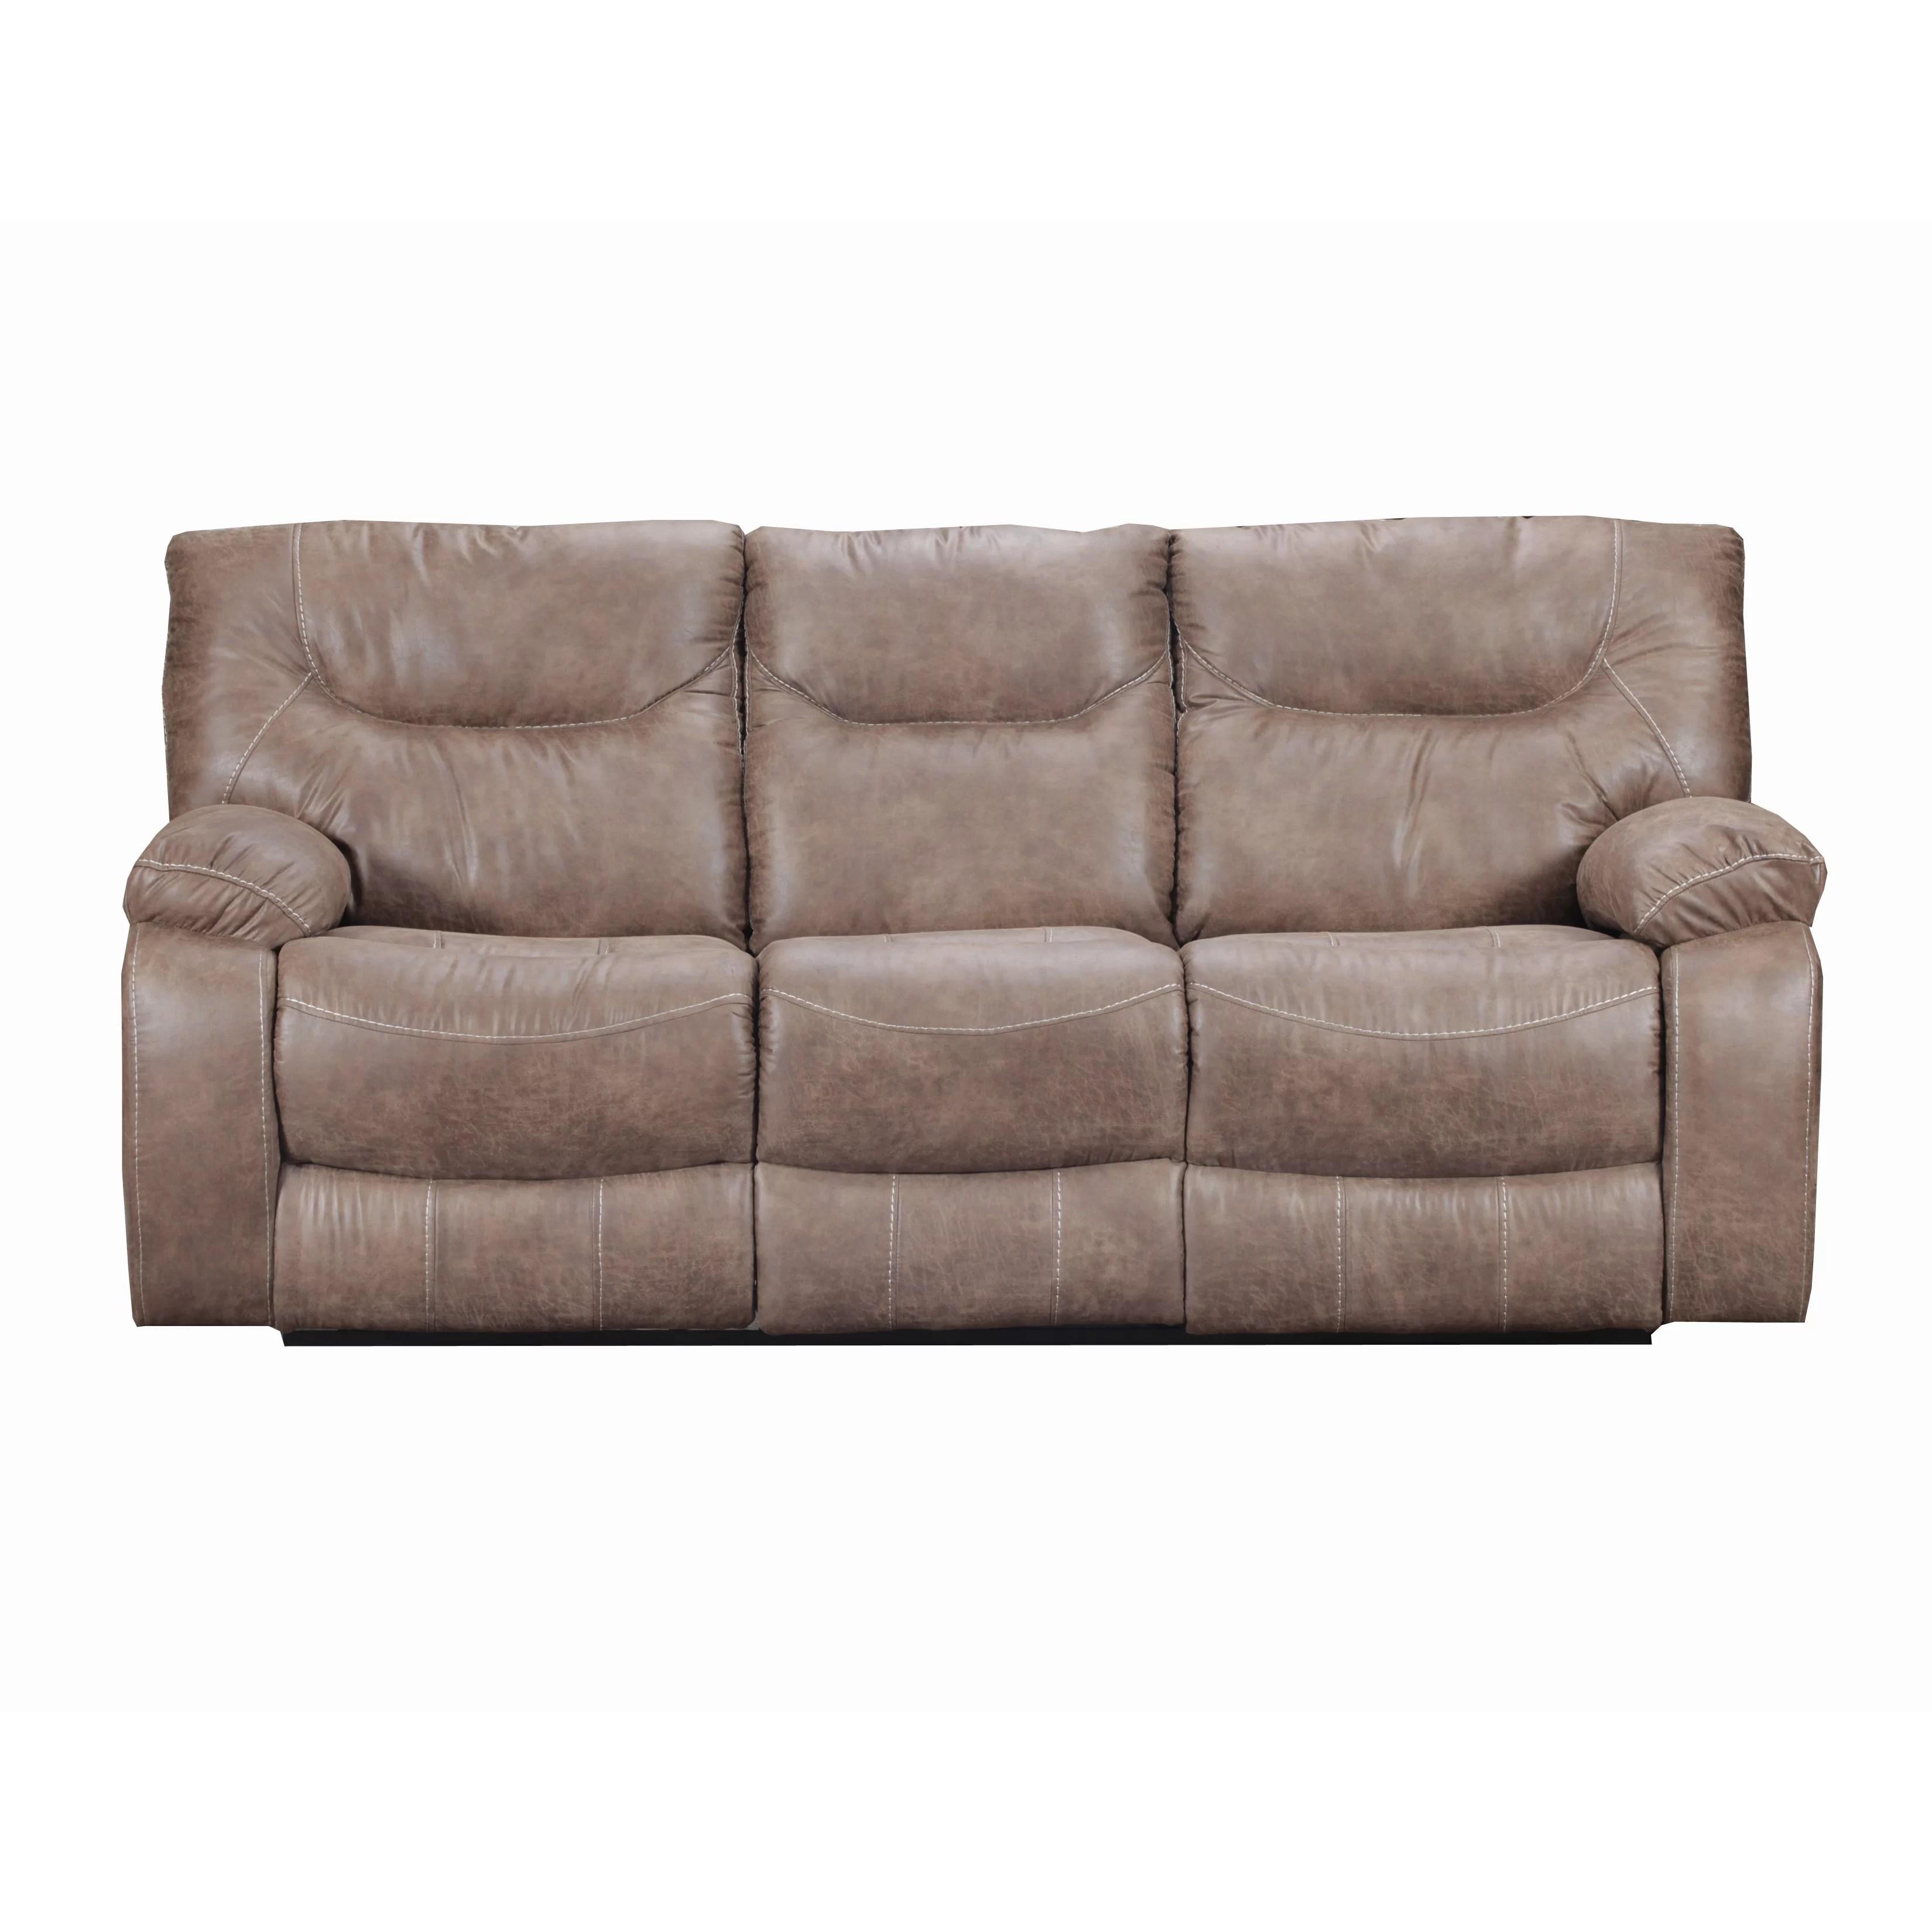 simmons beautyrest reclining sofa london road glasgow loon peak upholstery el capitan double motion